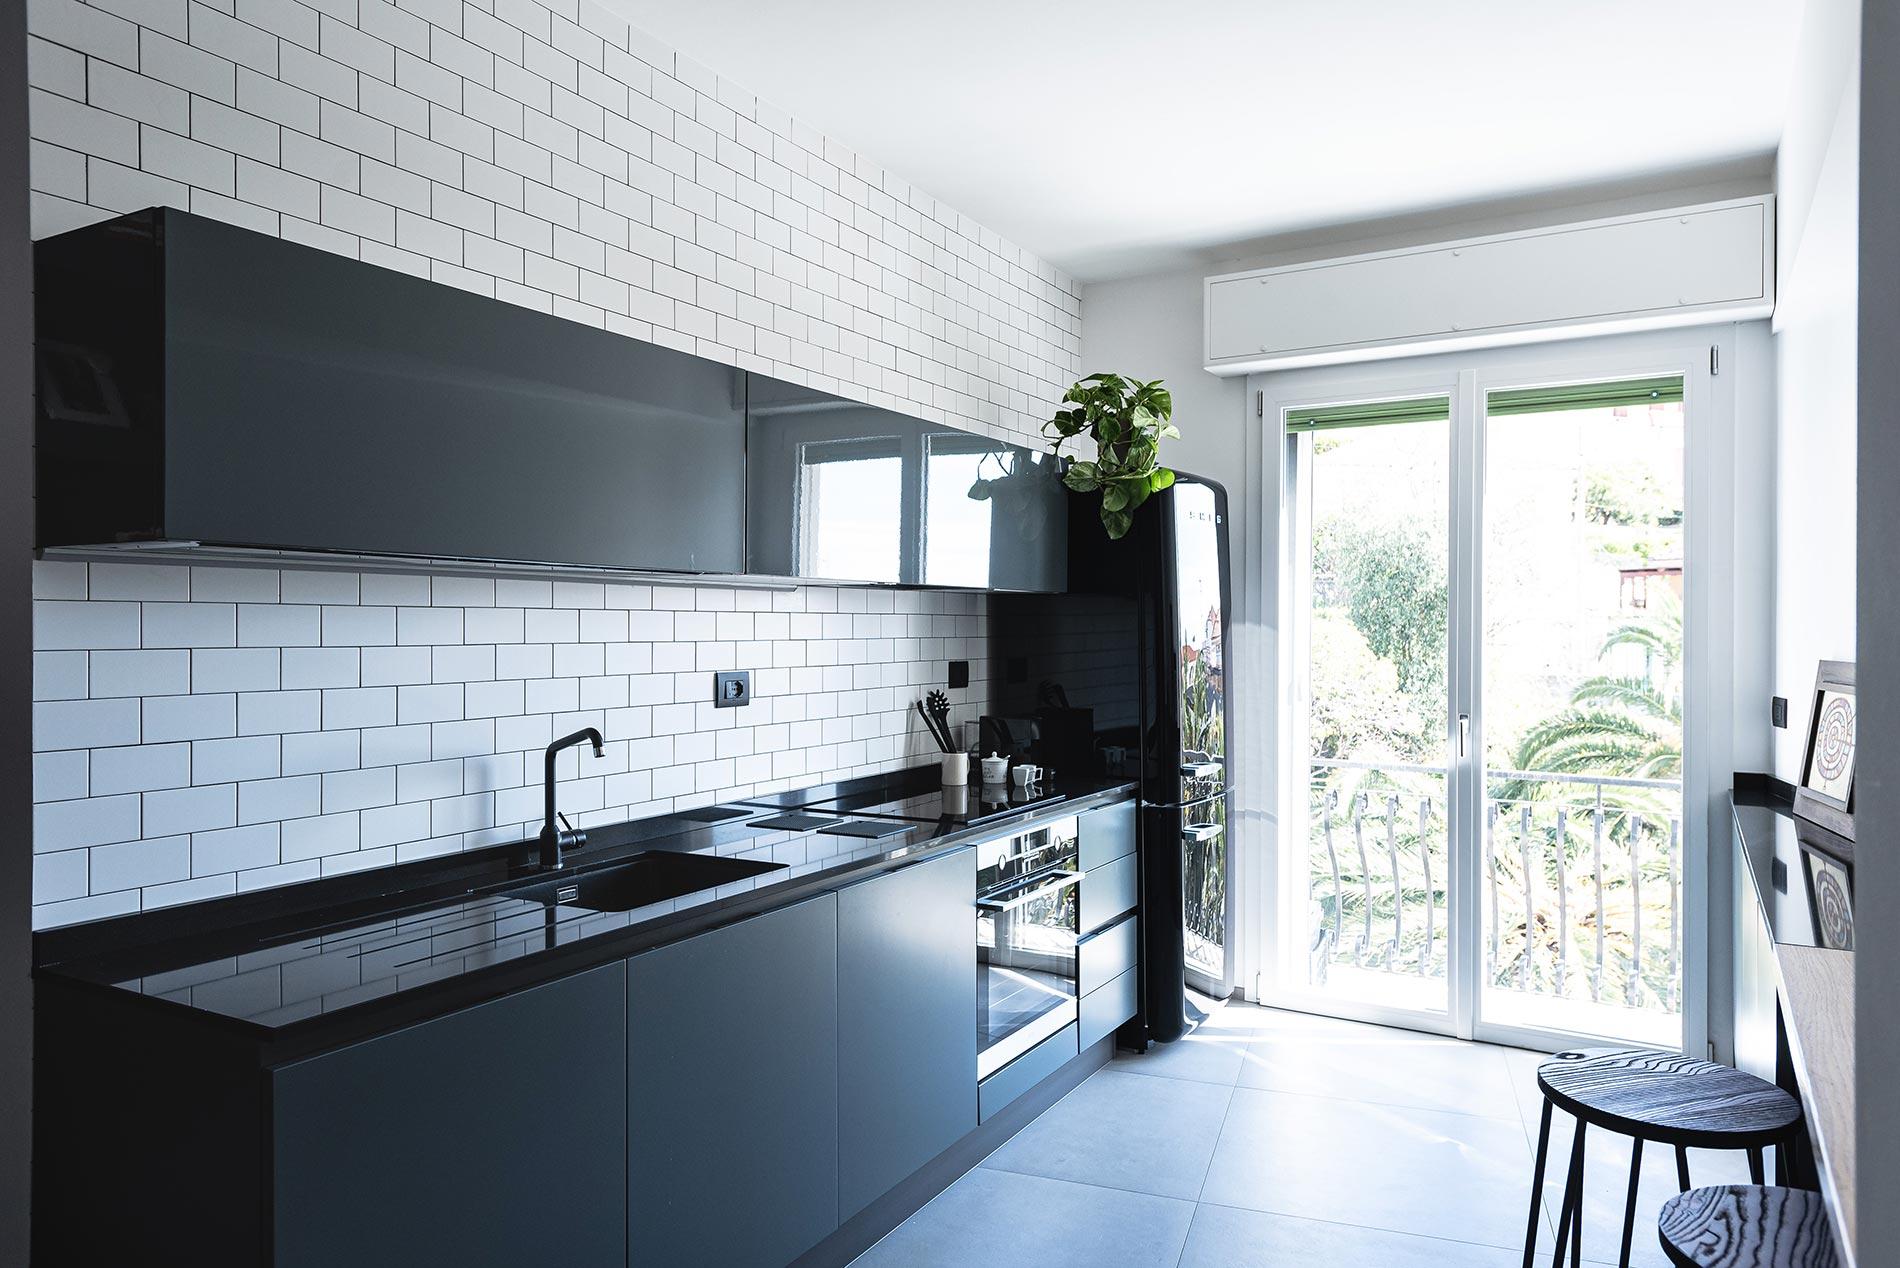 cucina su misura smeg nero